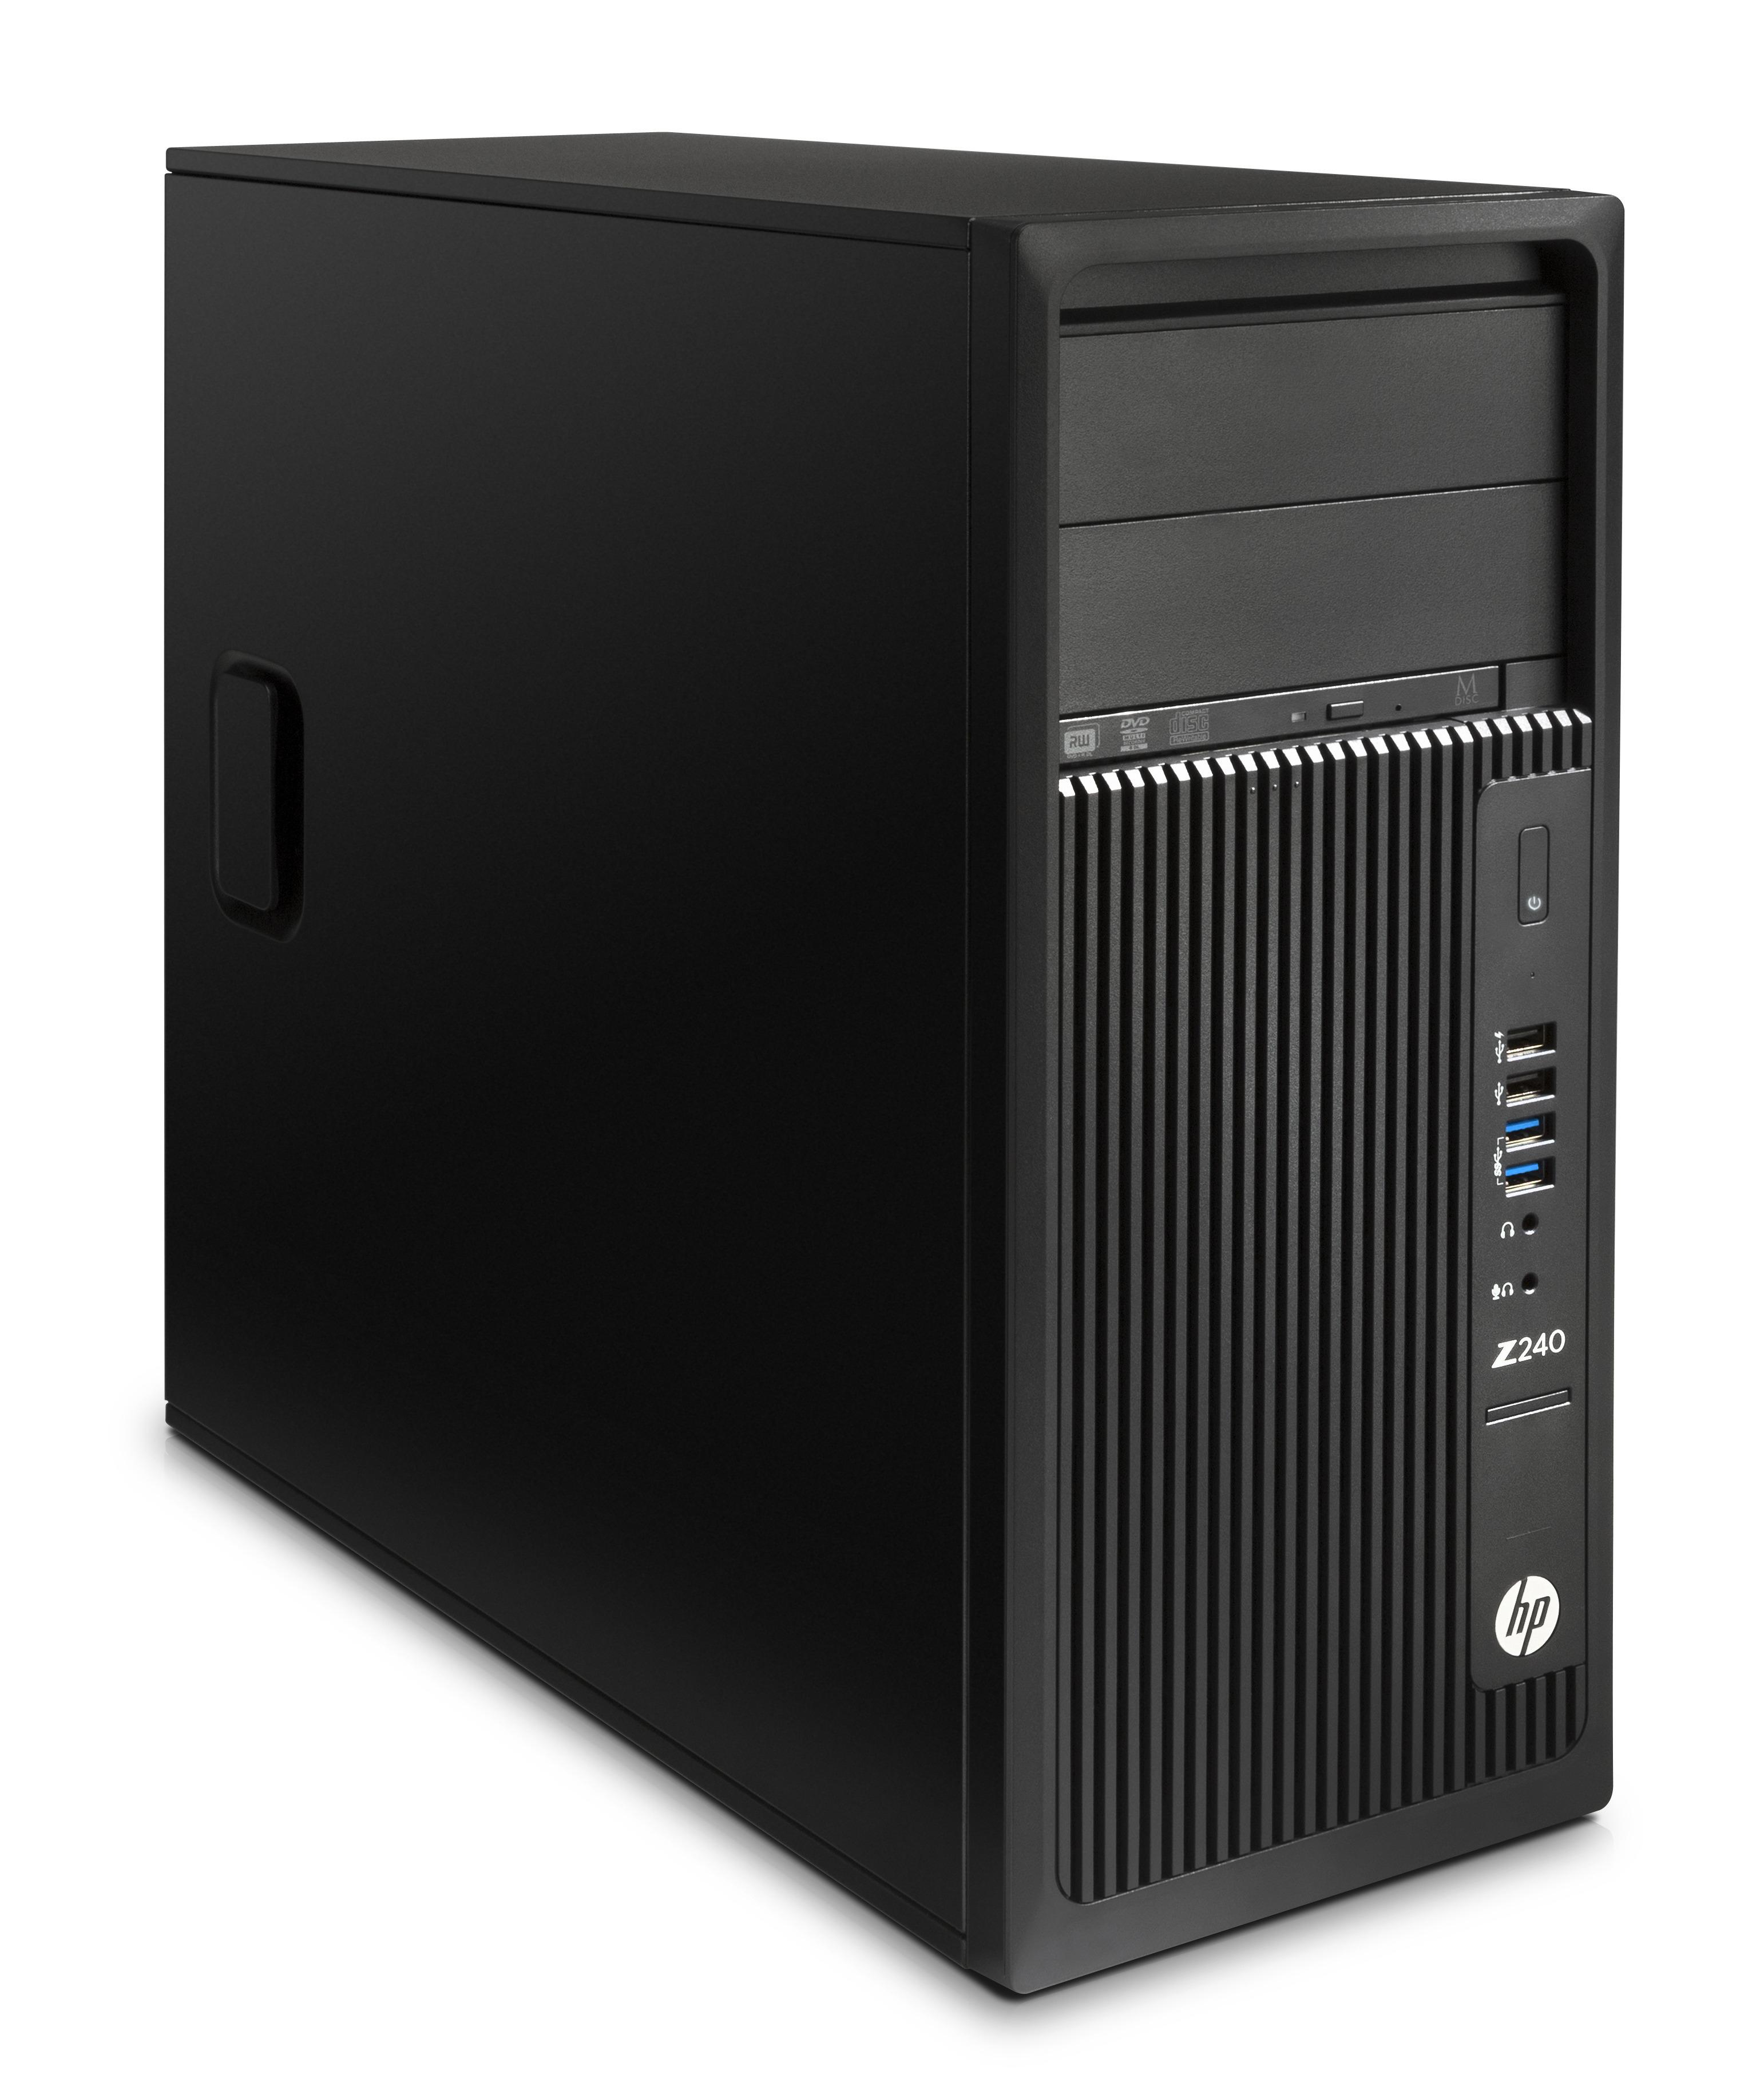 HP Z 240 MT 3.2GHz i5-6500 Tower Black